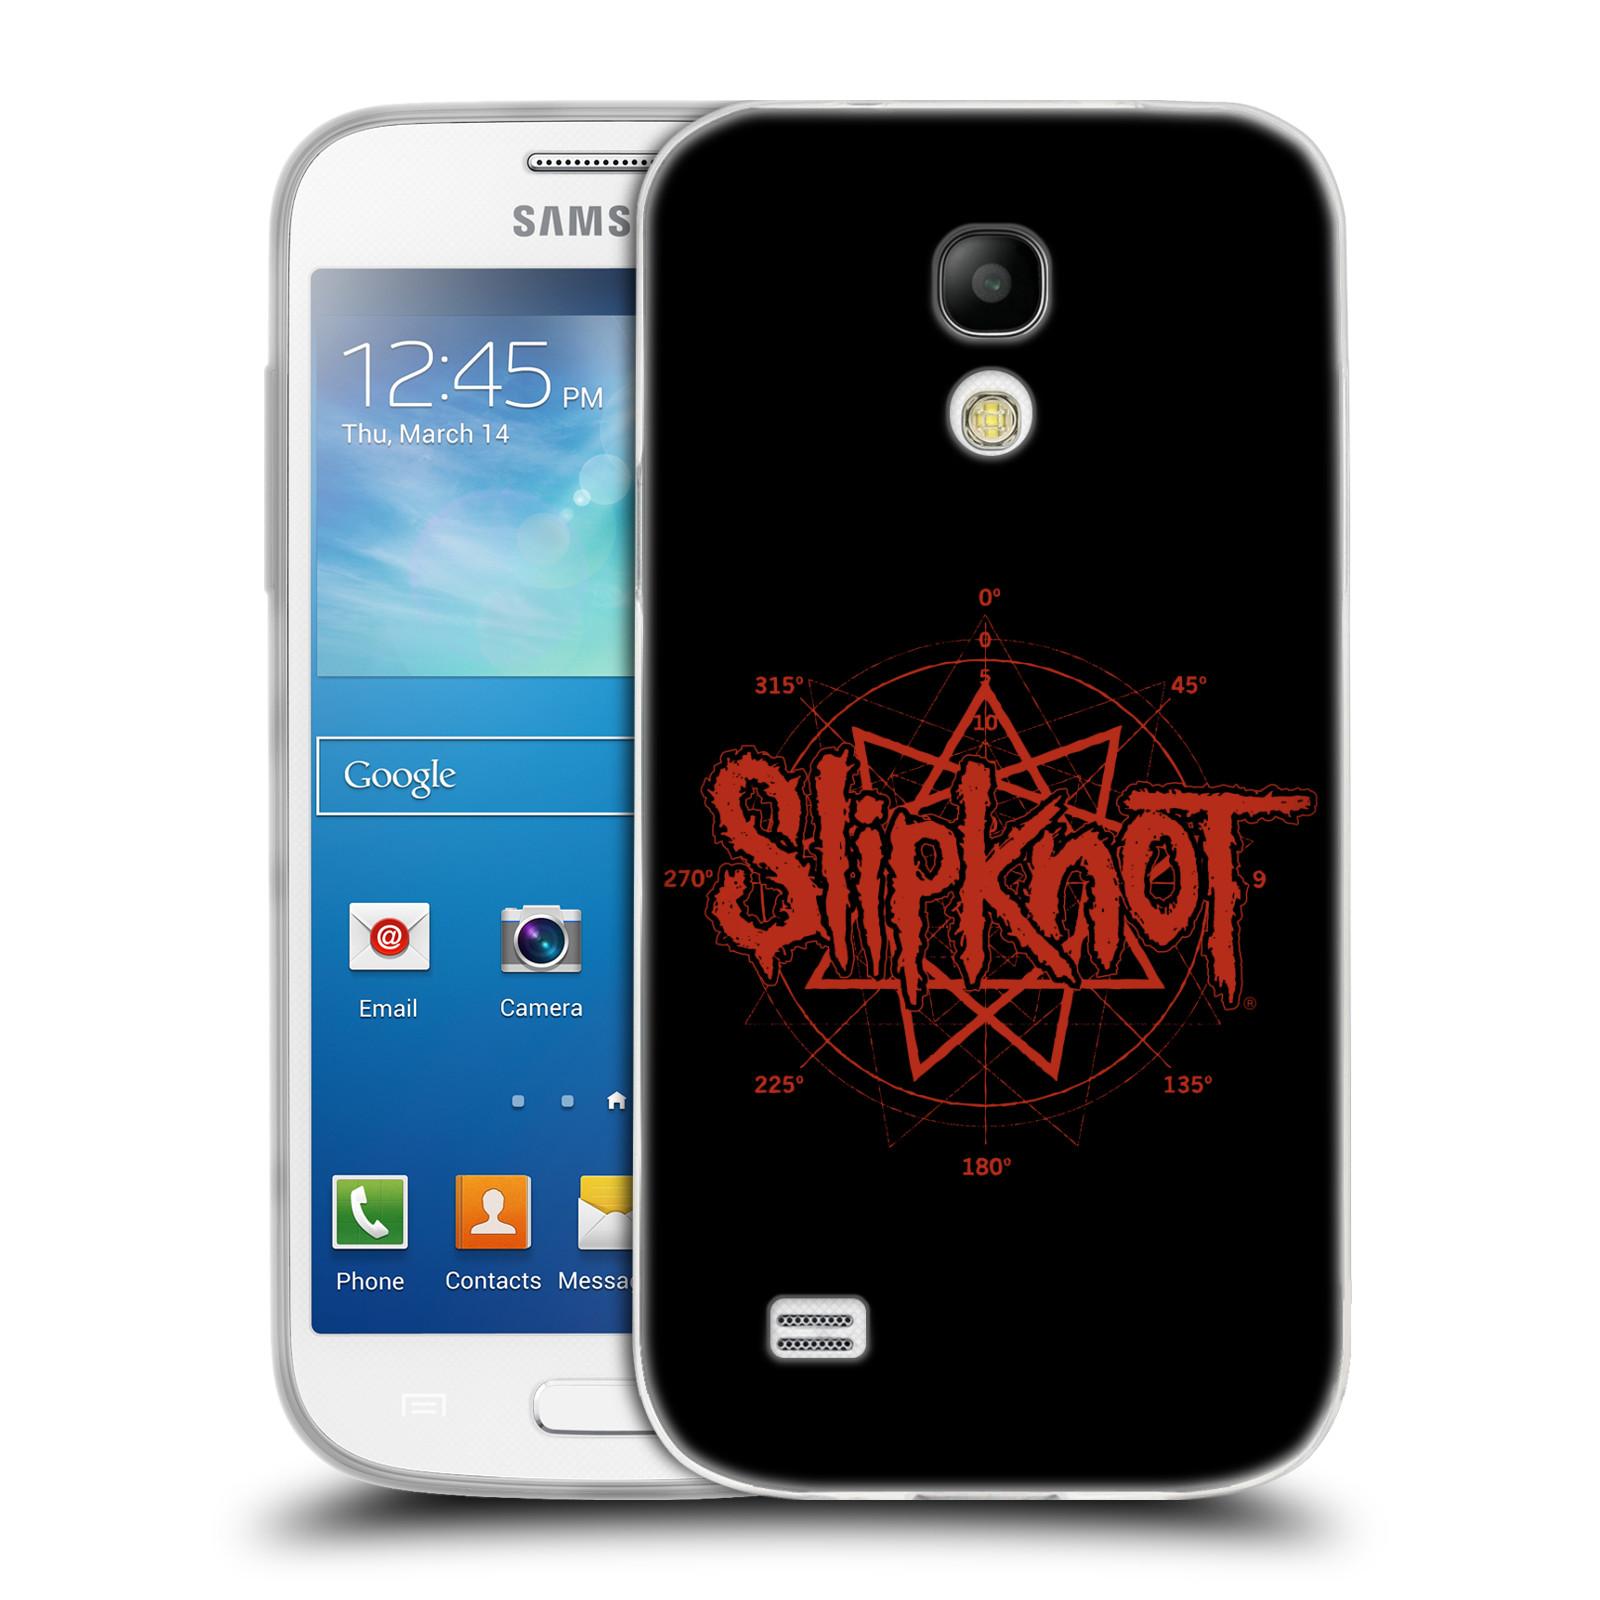 HEAD CASE silikonový obal na mobil Samsung Galaxy S4 MINI hudební skupina Slipknot logo